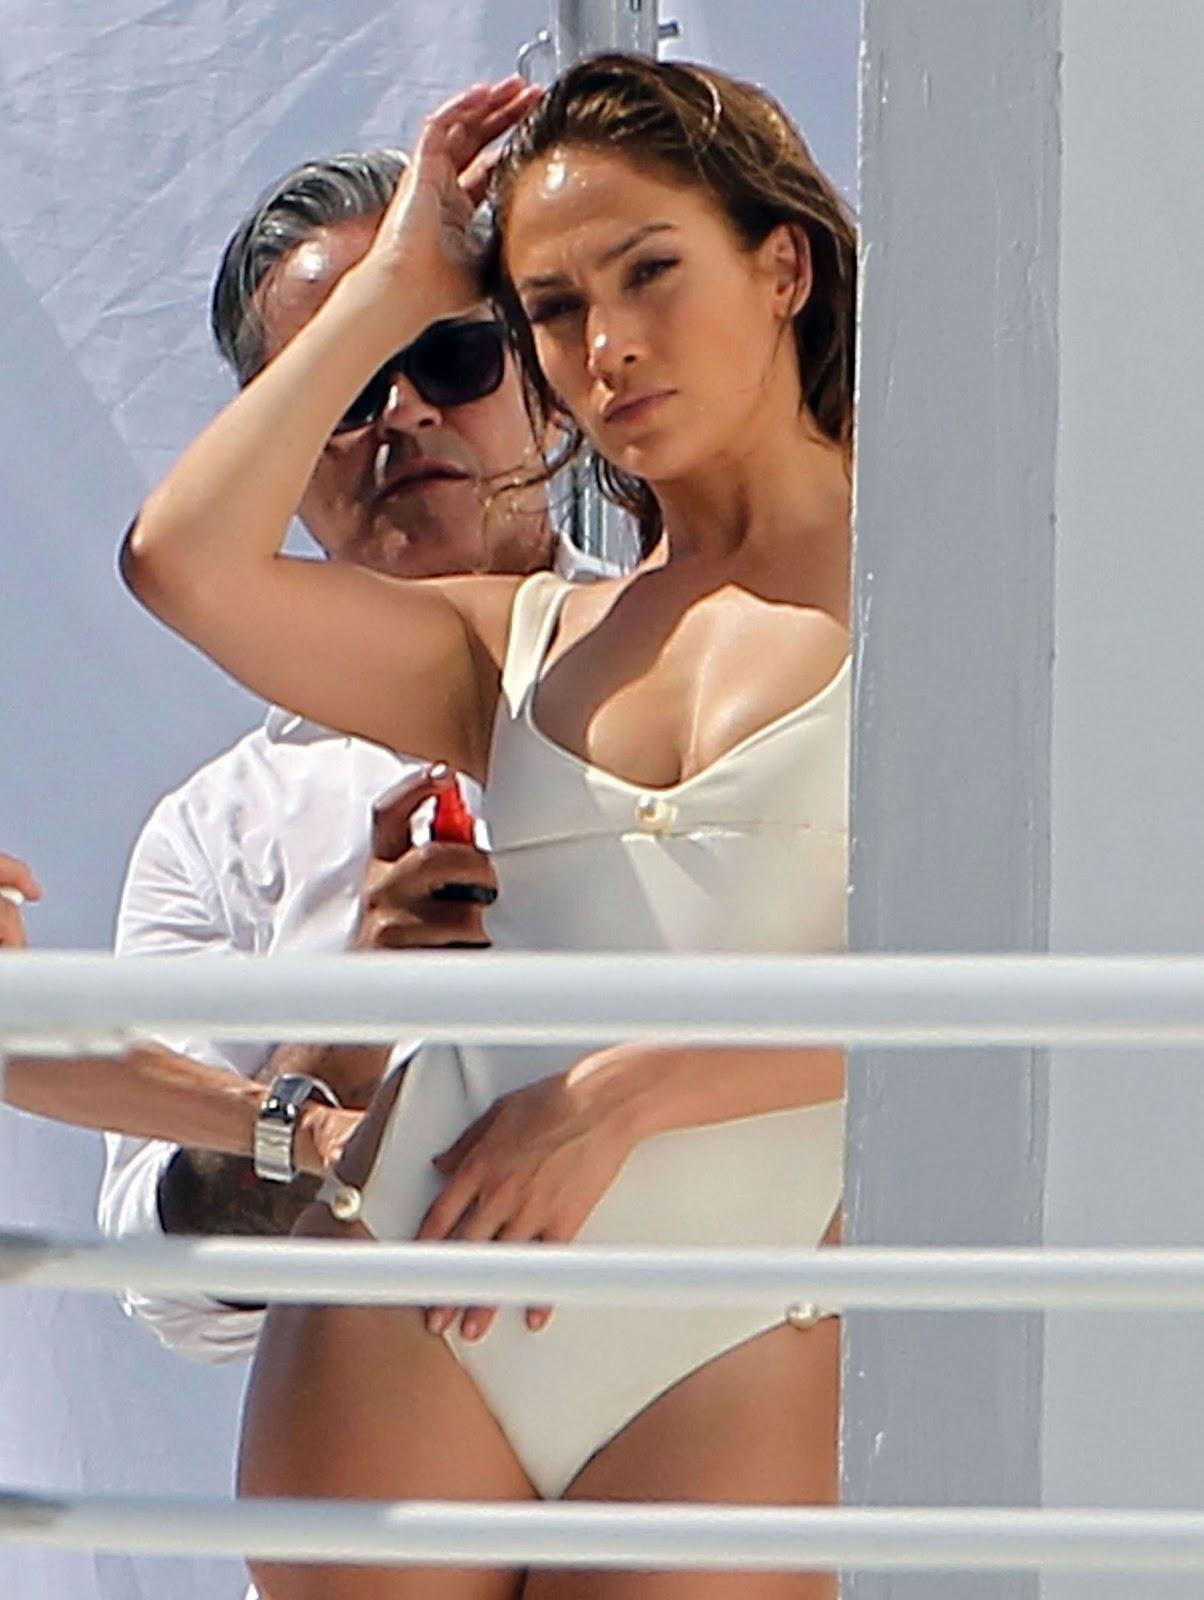 http://2.bp.blogspot.com/-gr54i-Aa-WQ/TyaztsZA4II/AAAAAAAAXTU/mLep0uqqjDY/s1600/Jennifer-Lopez+(1).jpg